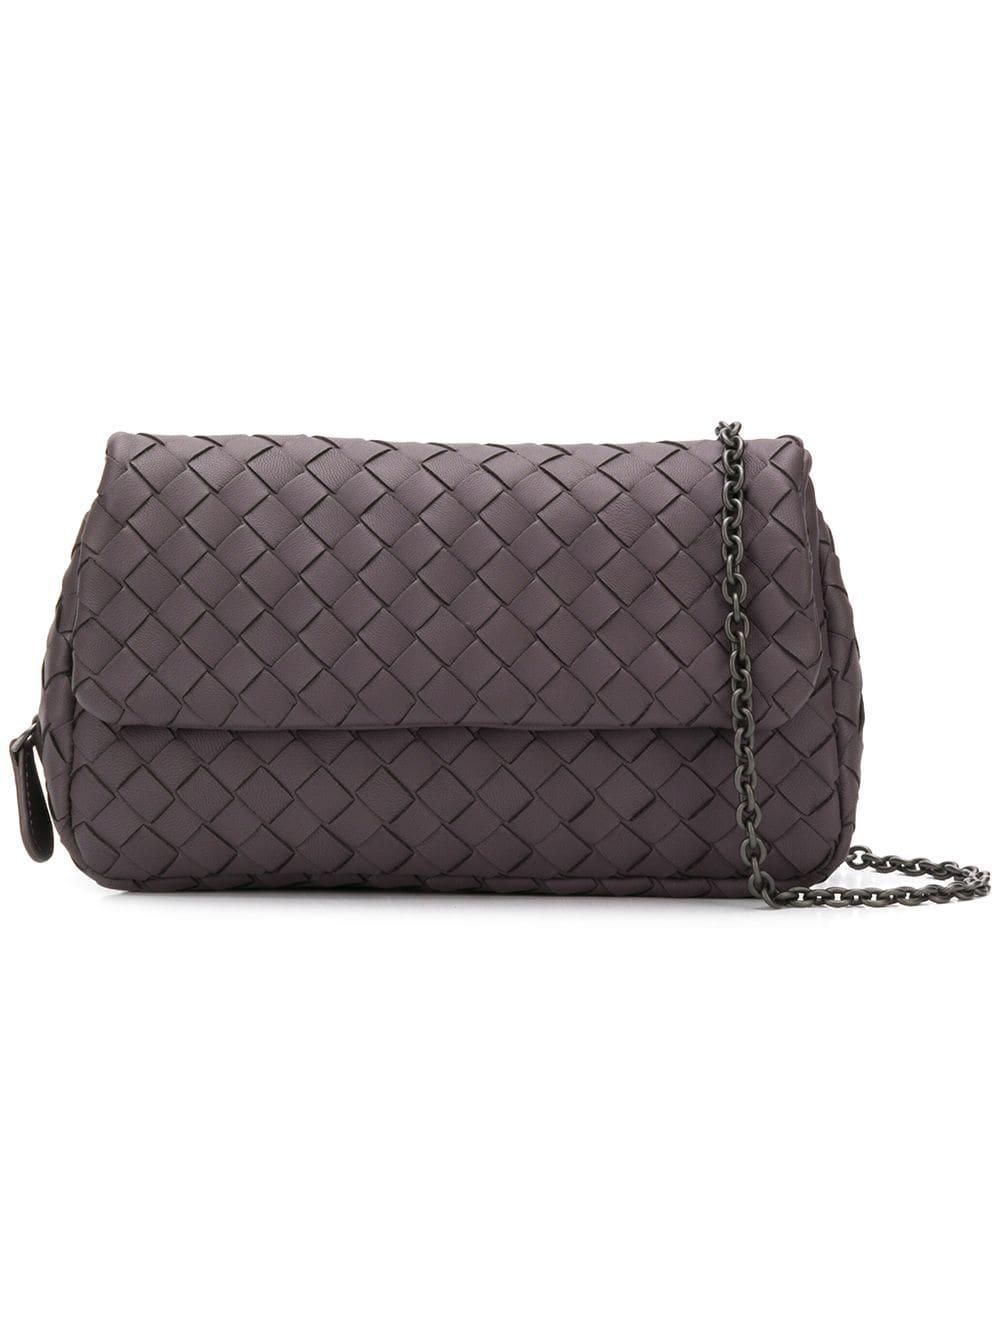 0909cd1d7c Bottega Veneta Intrecciato Crossbody Bag - Purple